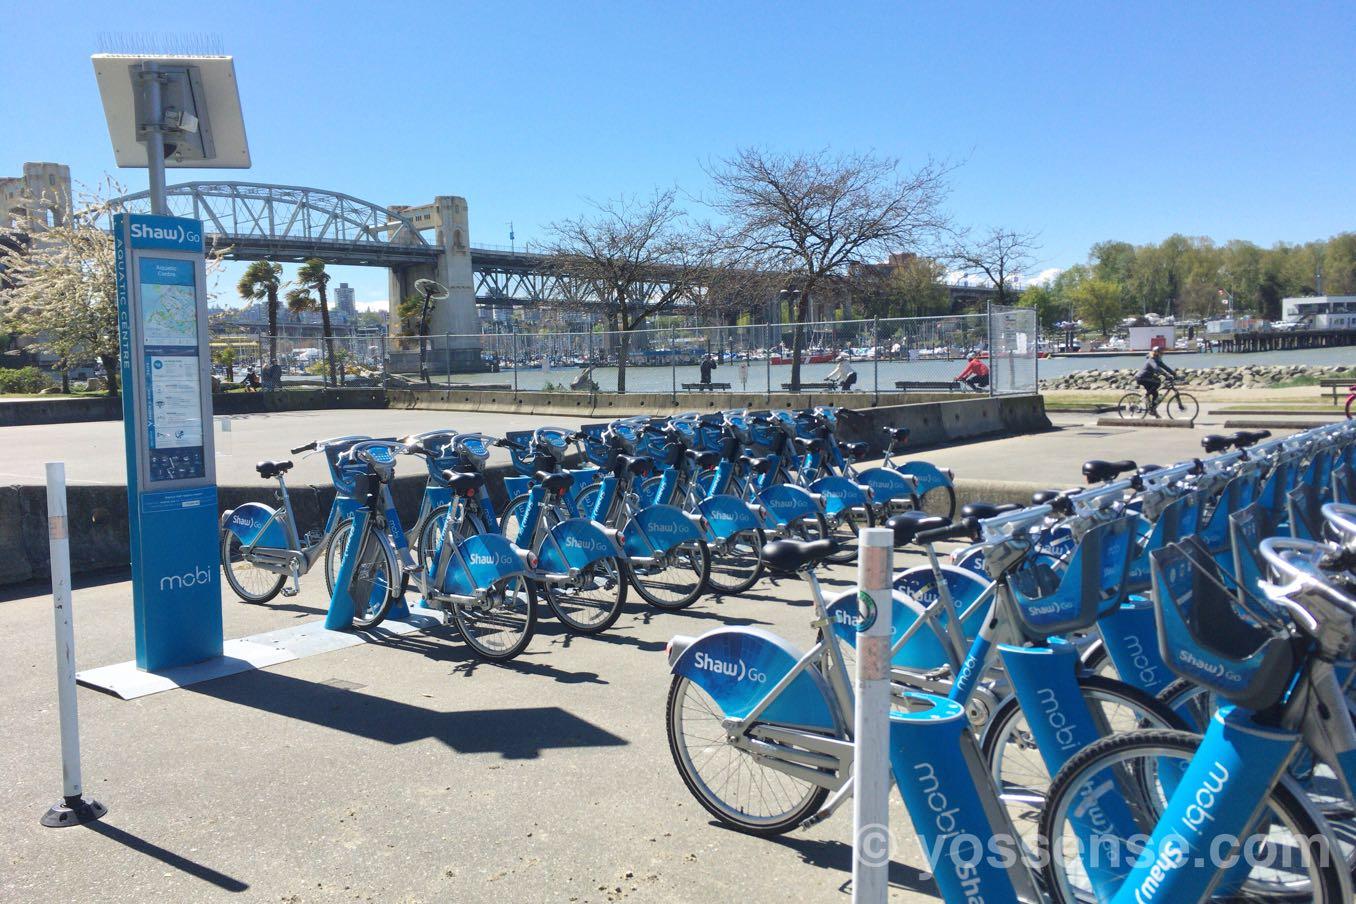 Mobi Bike Station